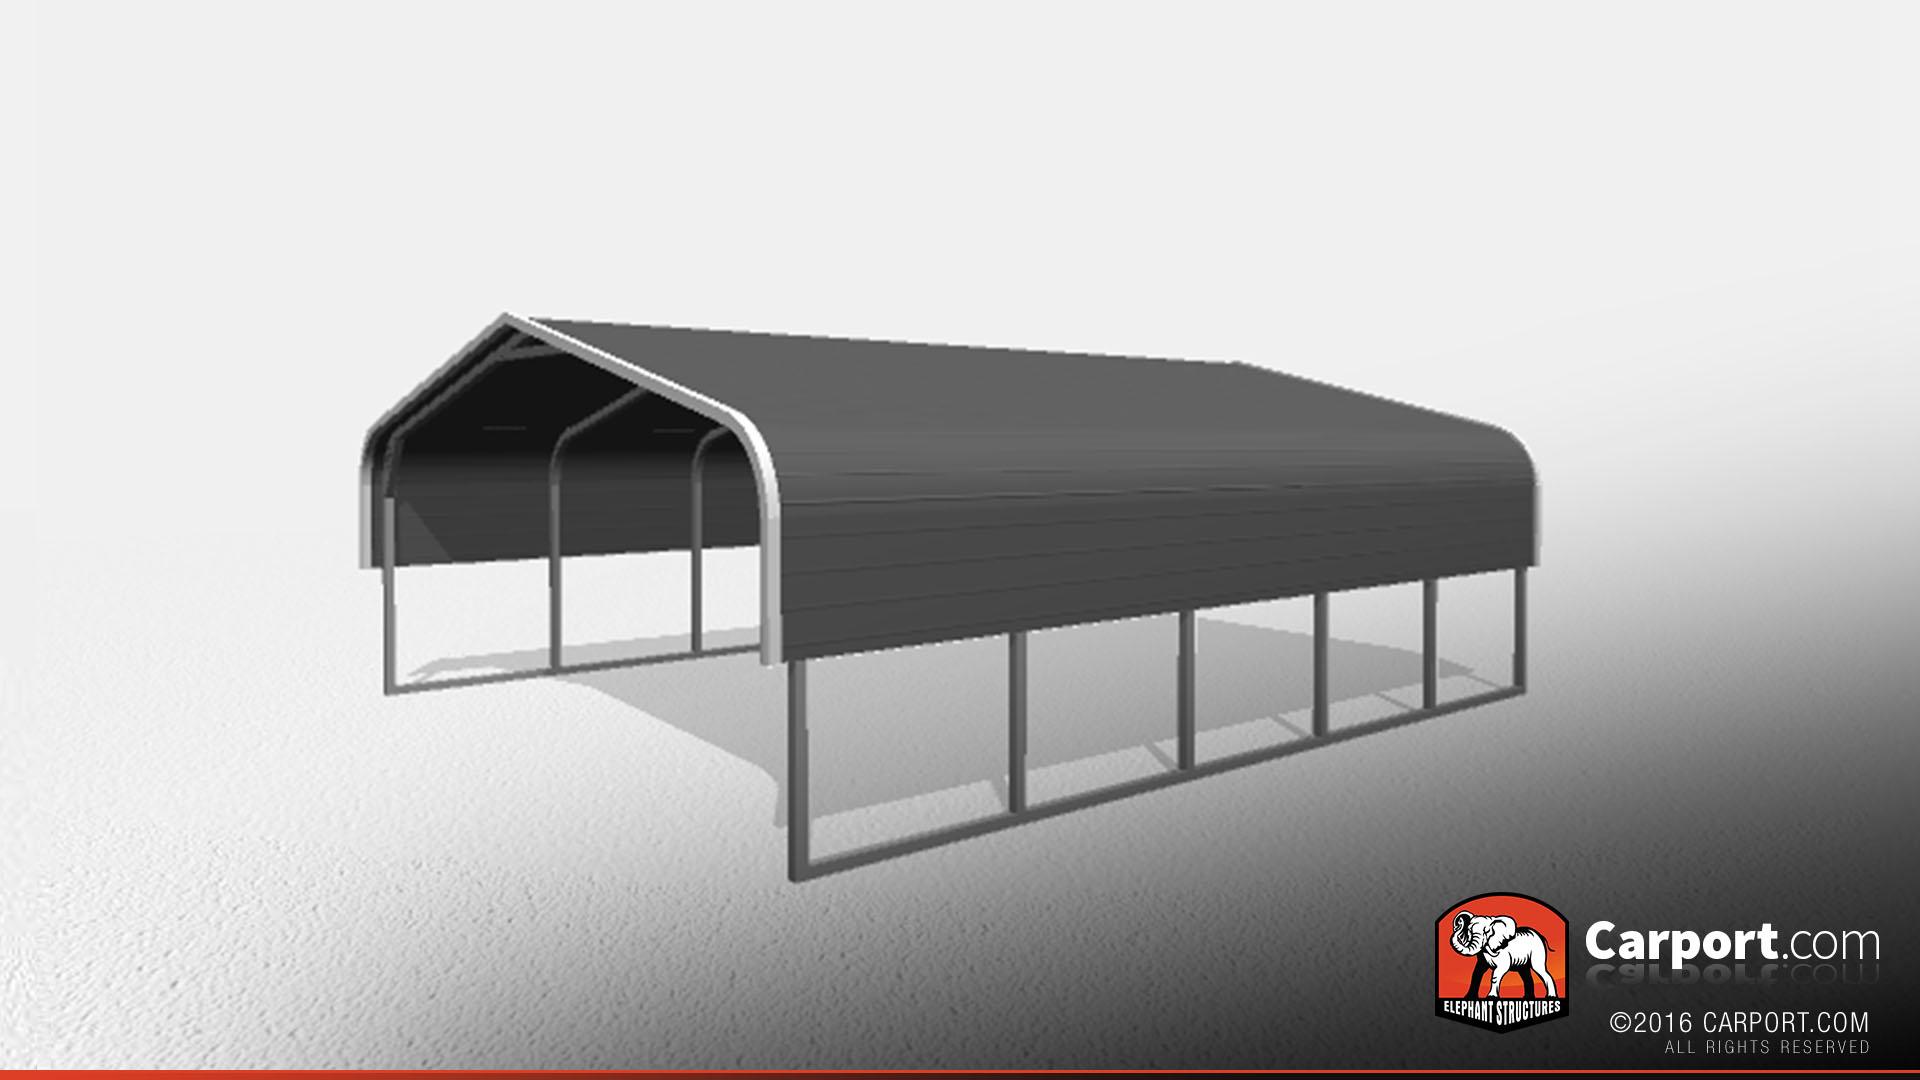 double car metal carport 1 18x21x6